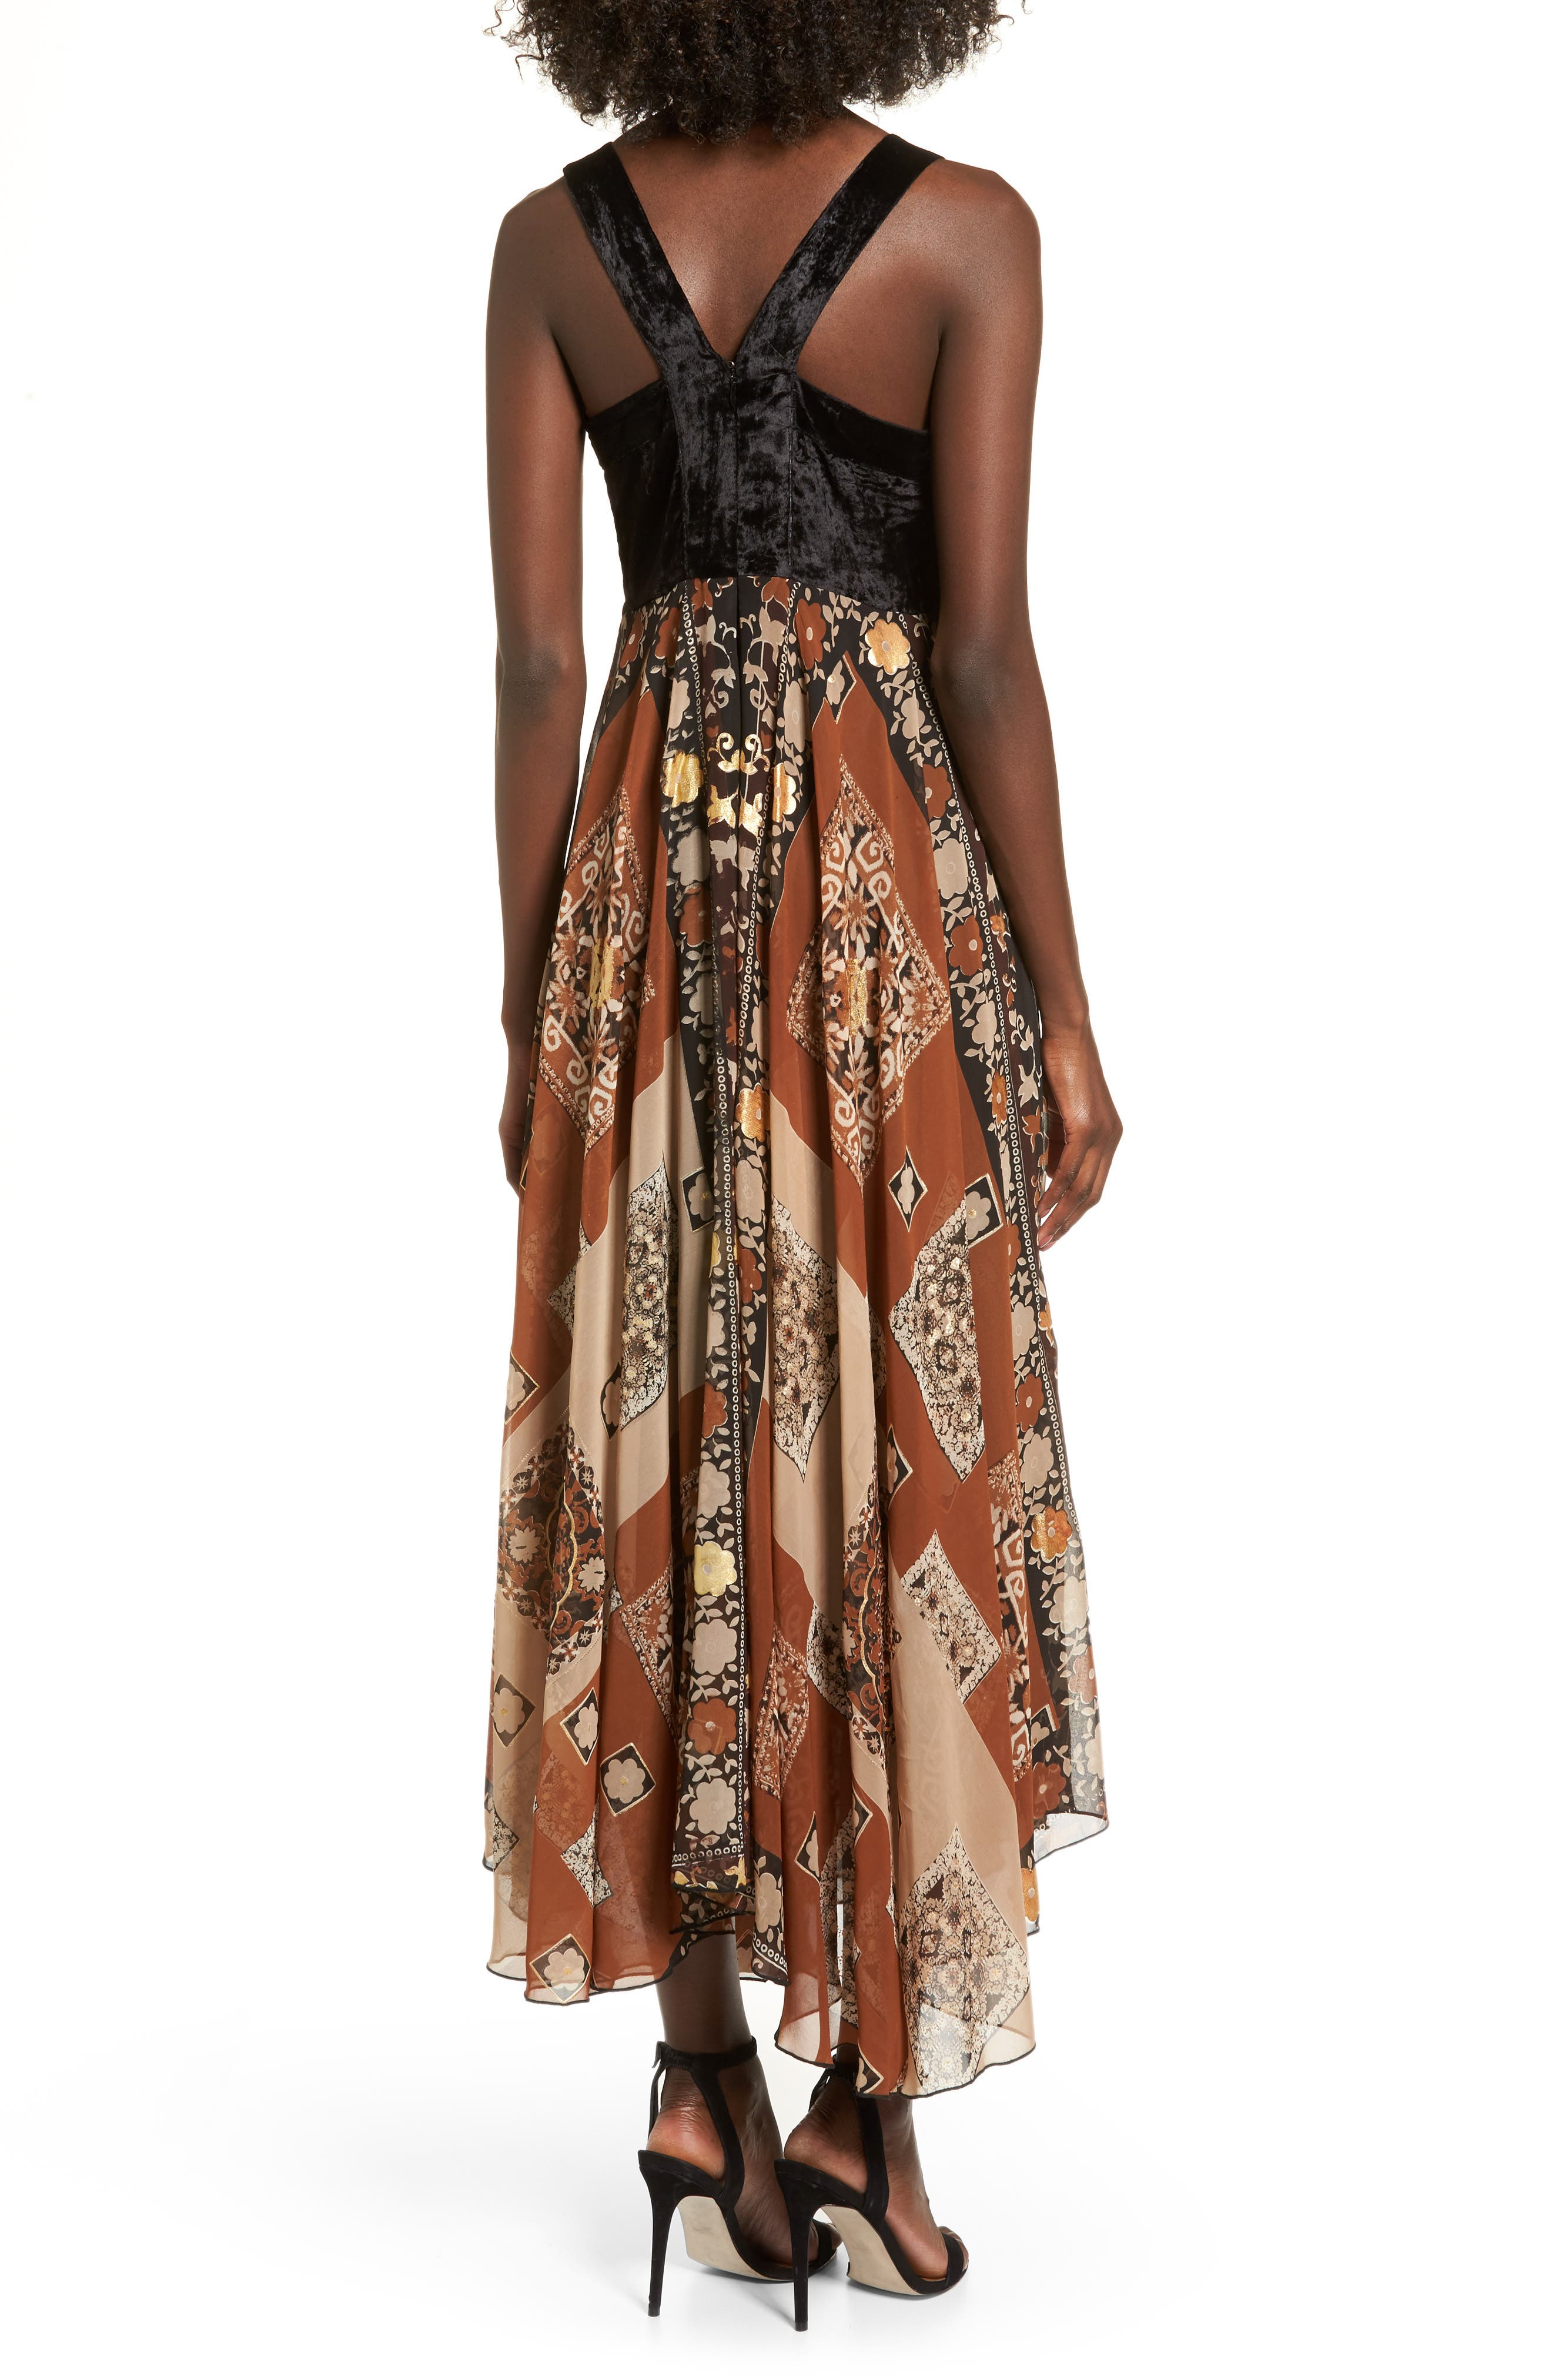 Sonder Embroidered Maxi Dress,                             Alternate thumbnail 2, color,                             200